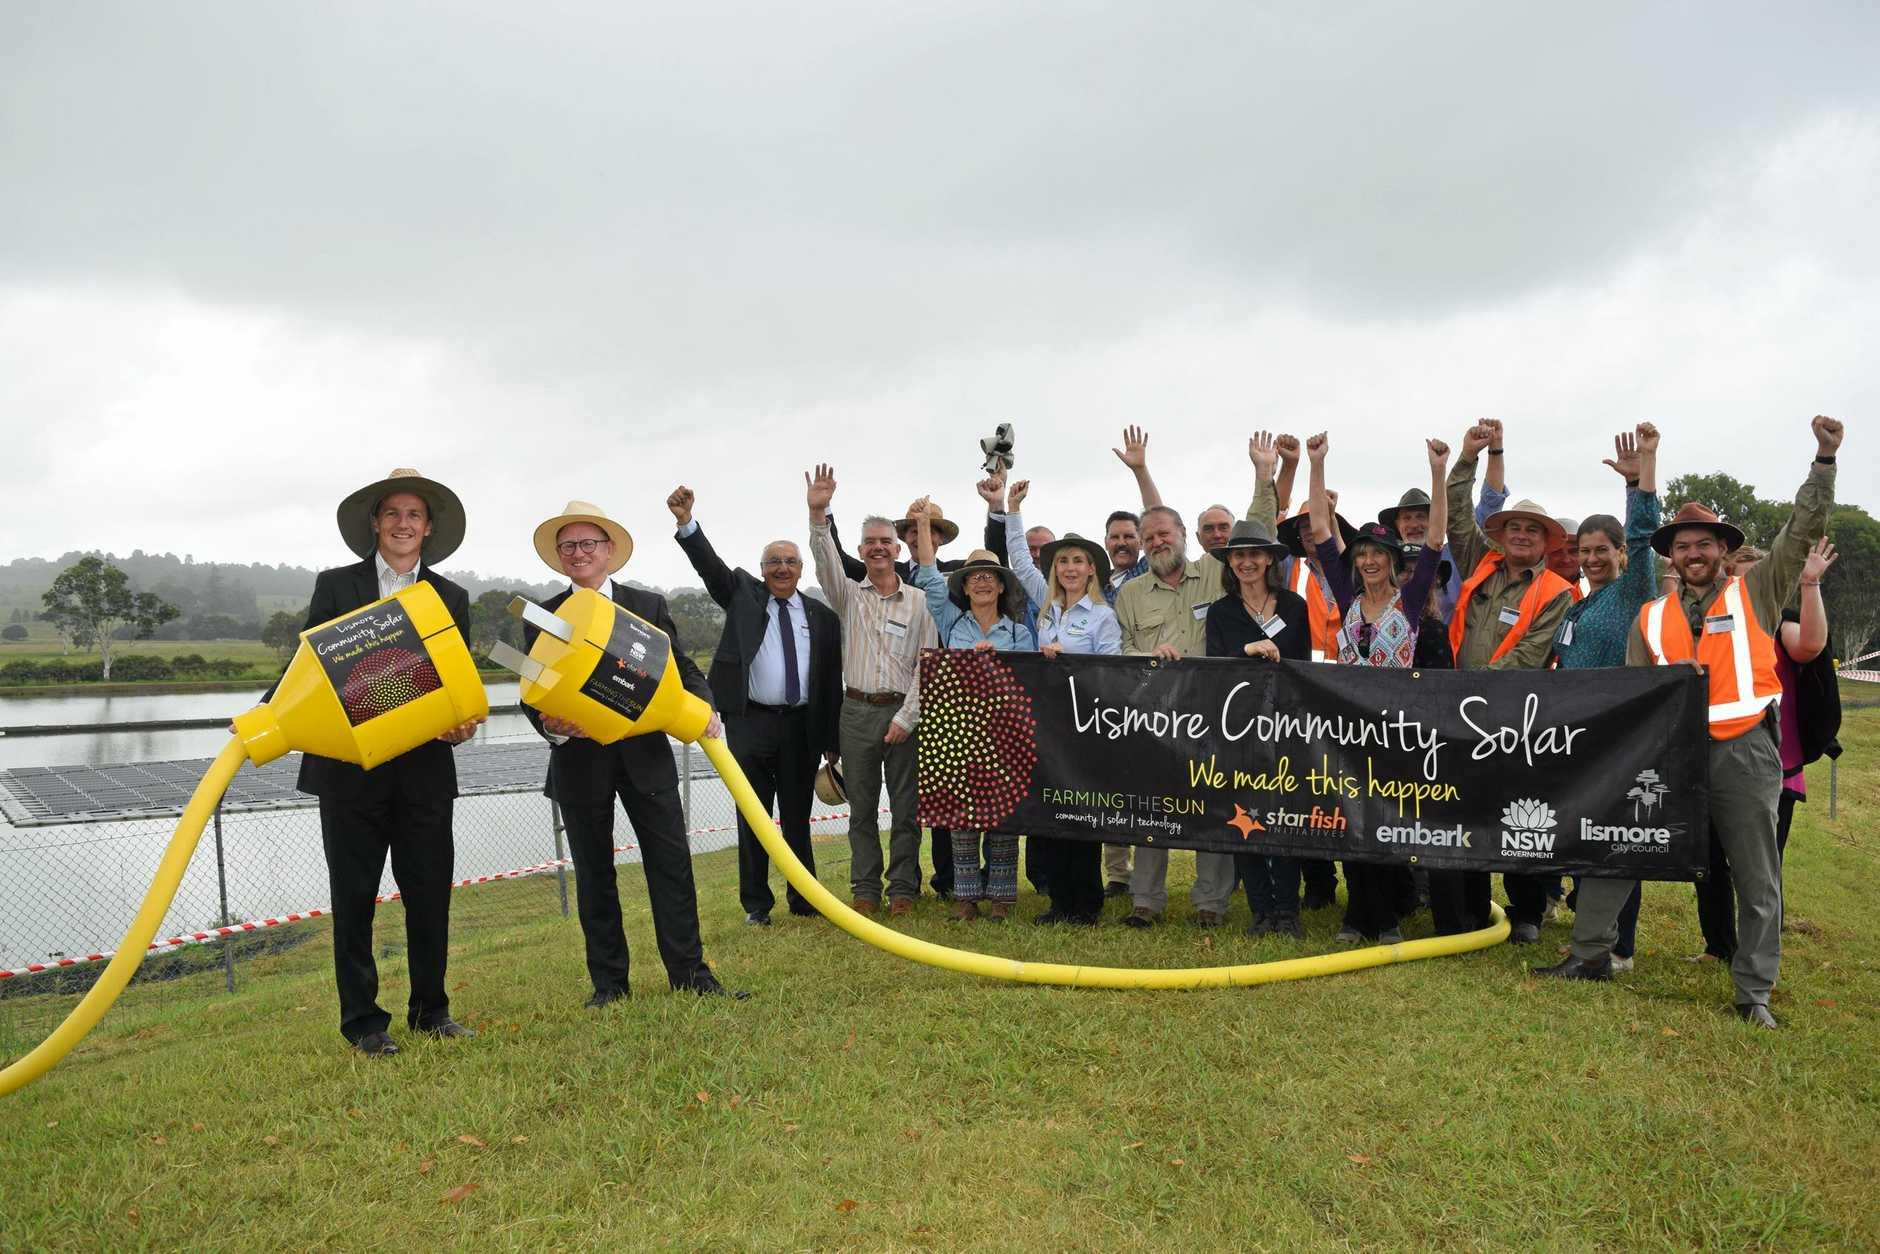 COMMUNITY SOLAR PROJECT: Lismore Community Solar project includes the construction of Australia's largest floating solar farm.